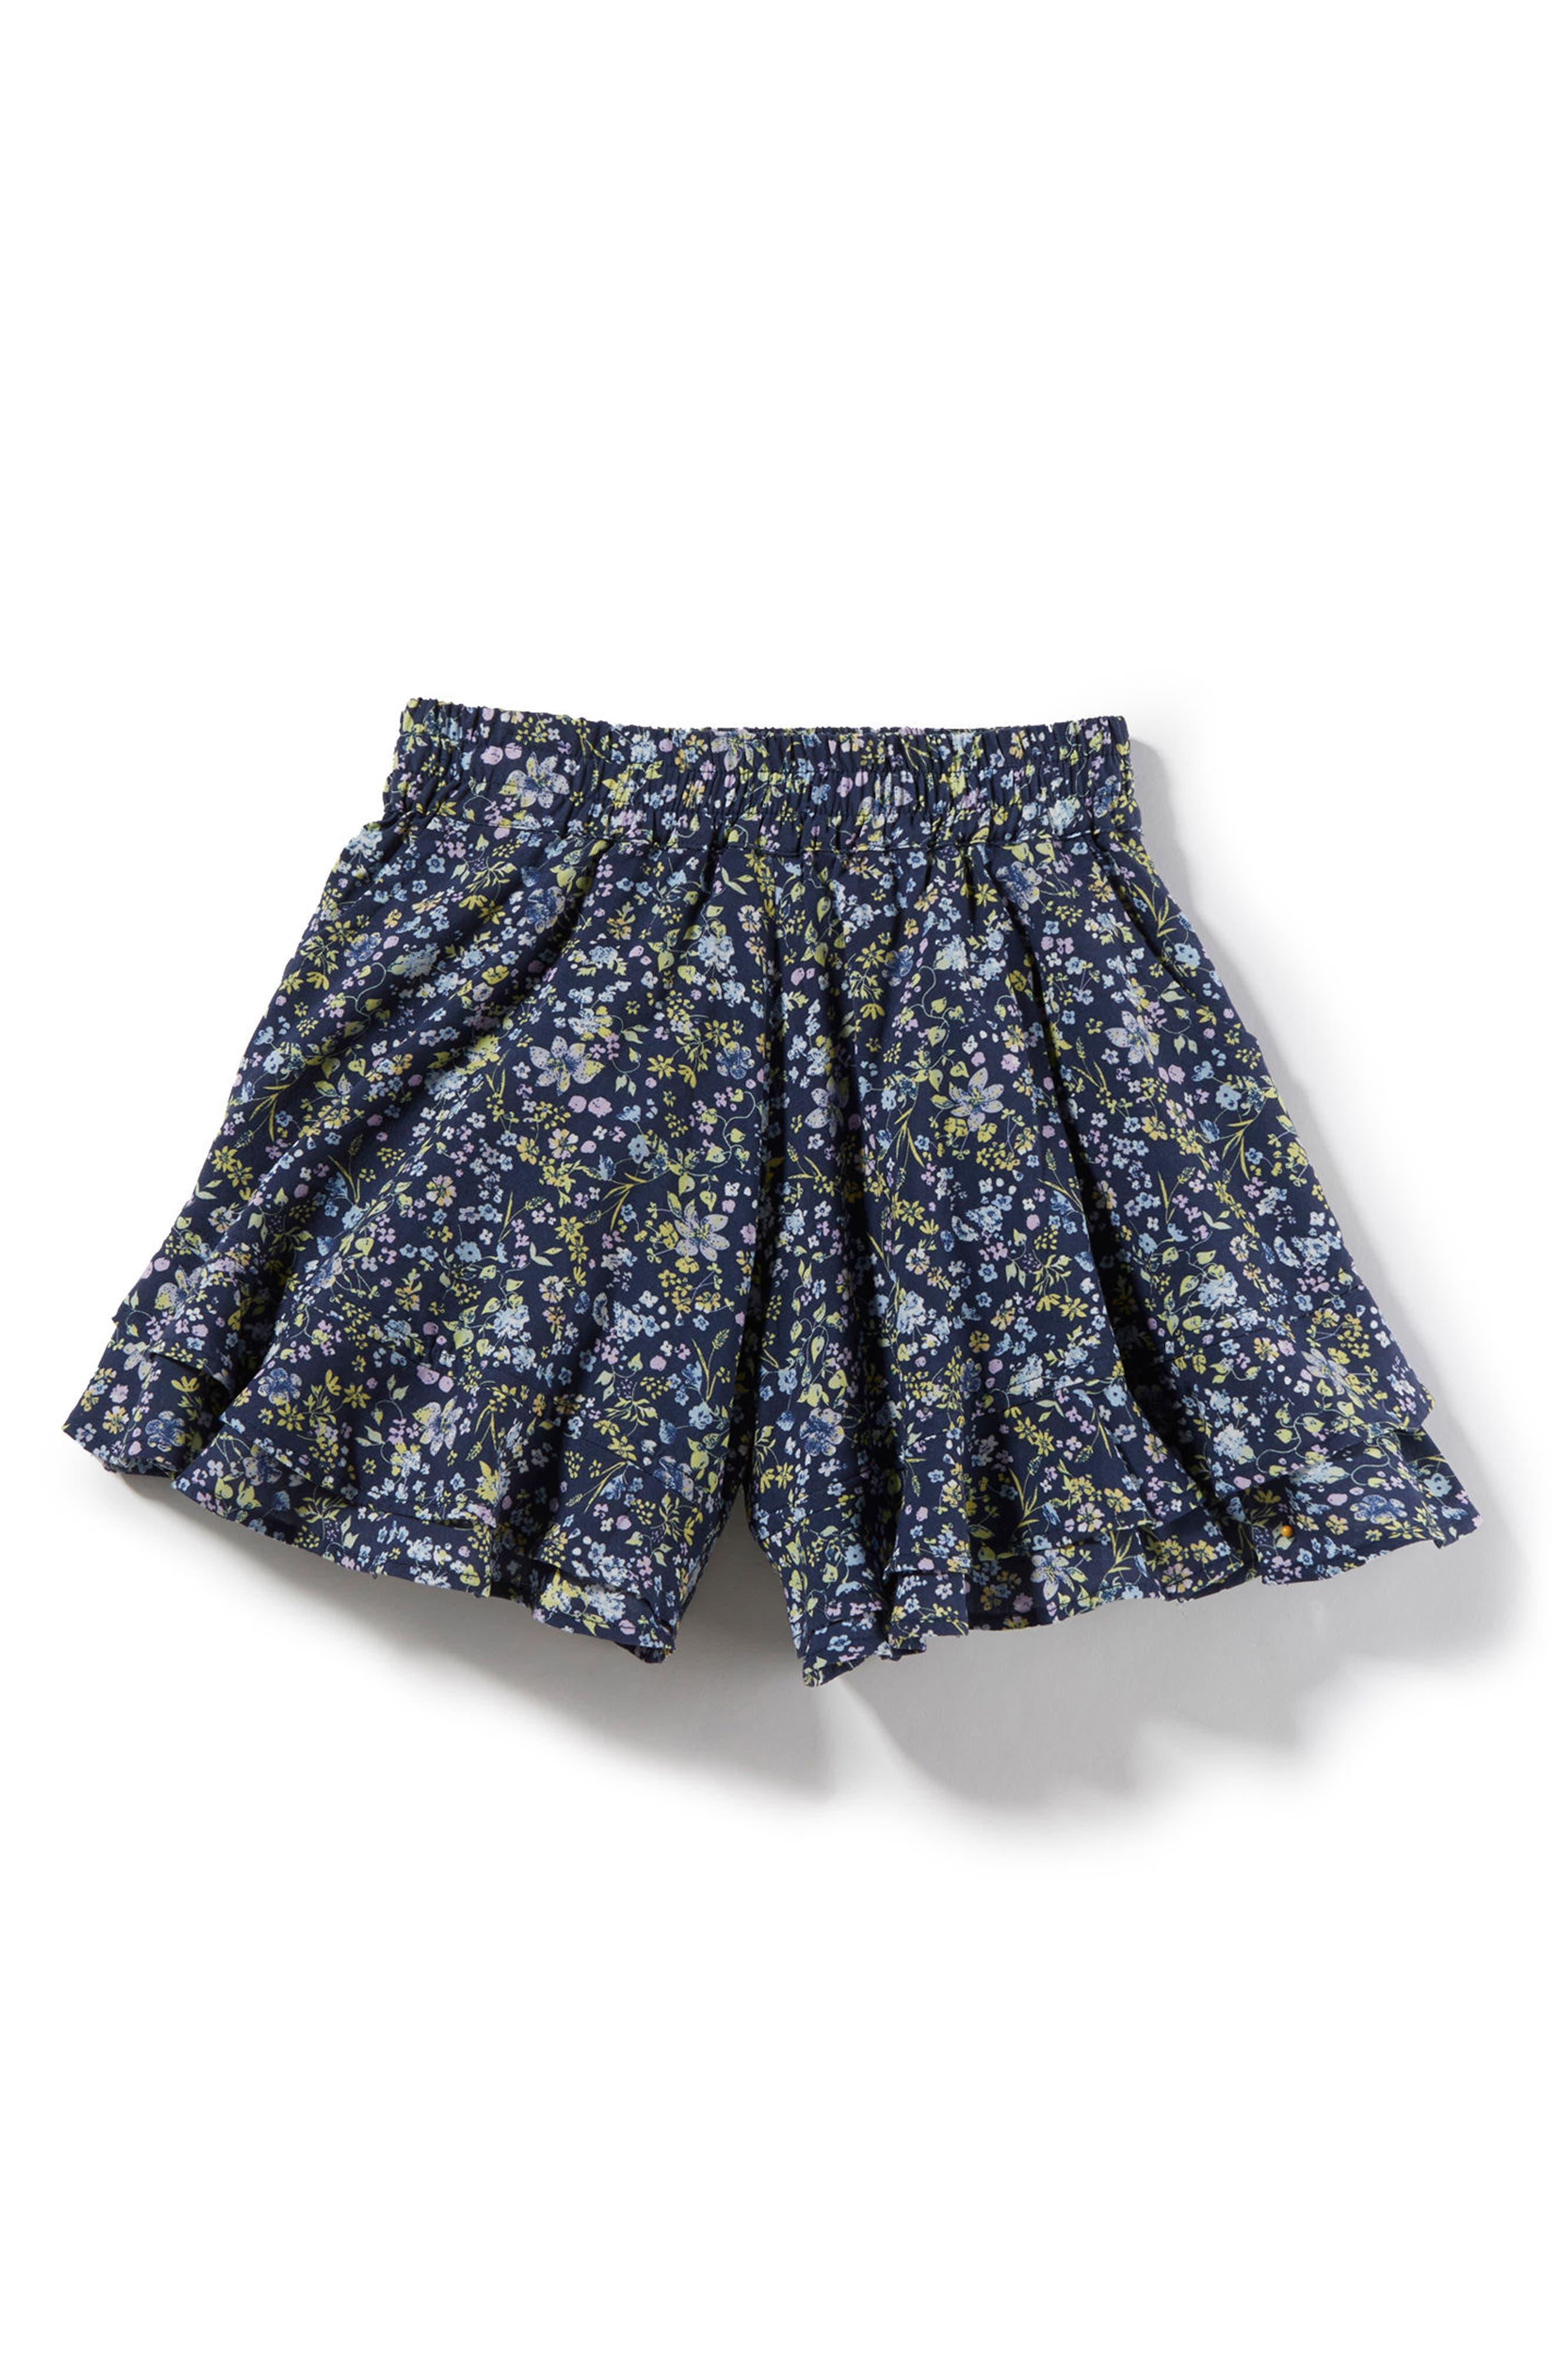 Paige Ruffle Shorts,                         Main,                         color, Blue